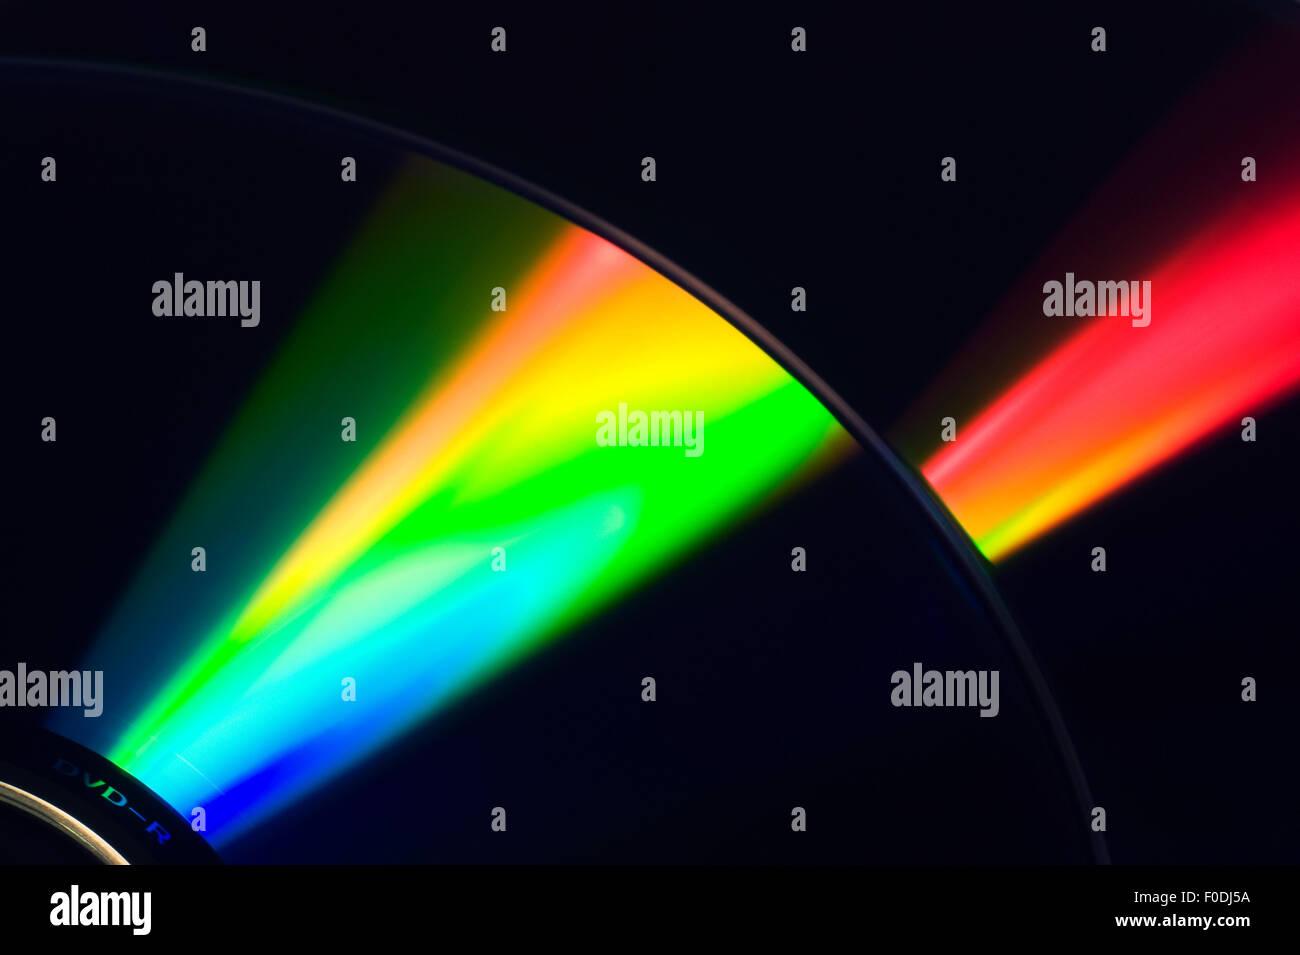 Laser on DVD Background - Stock Image